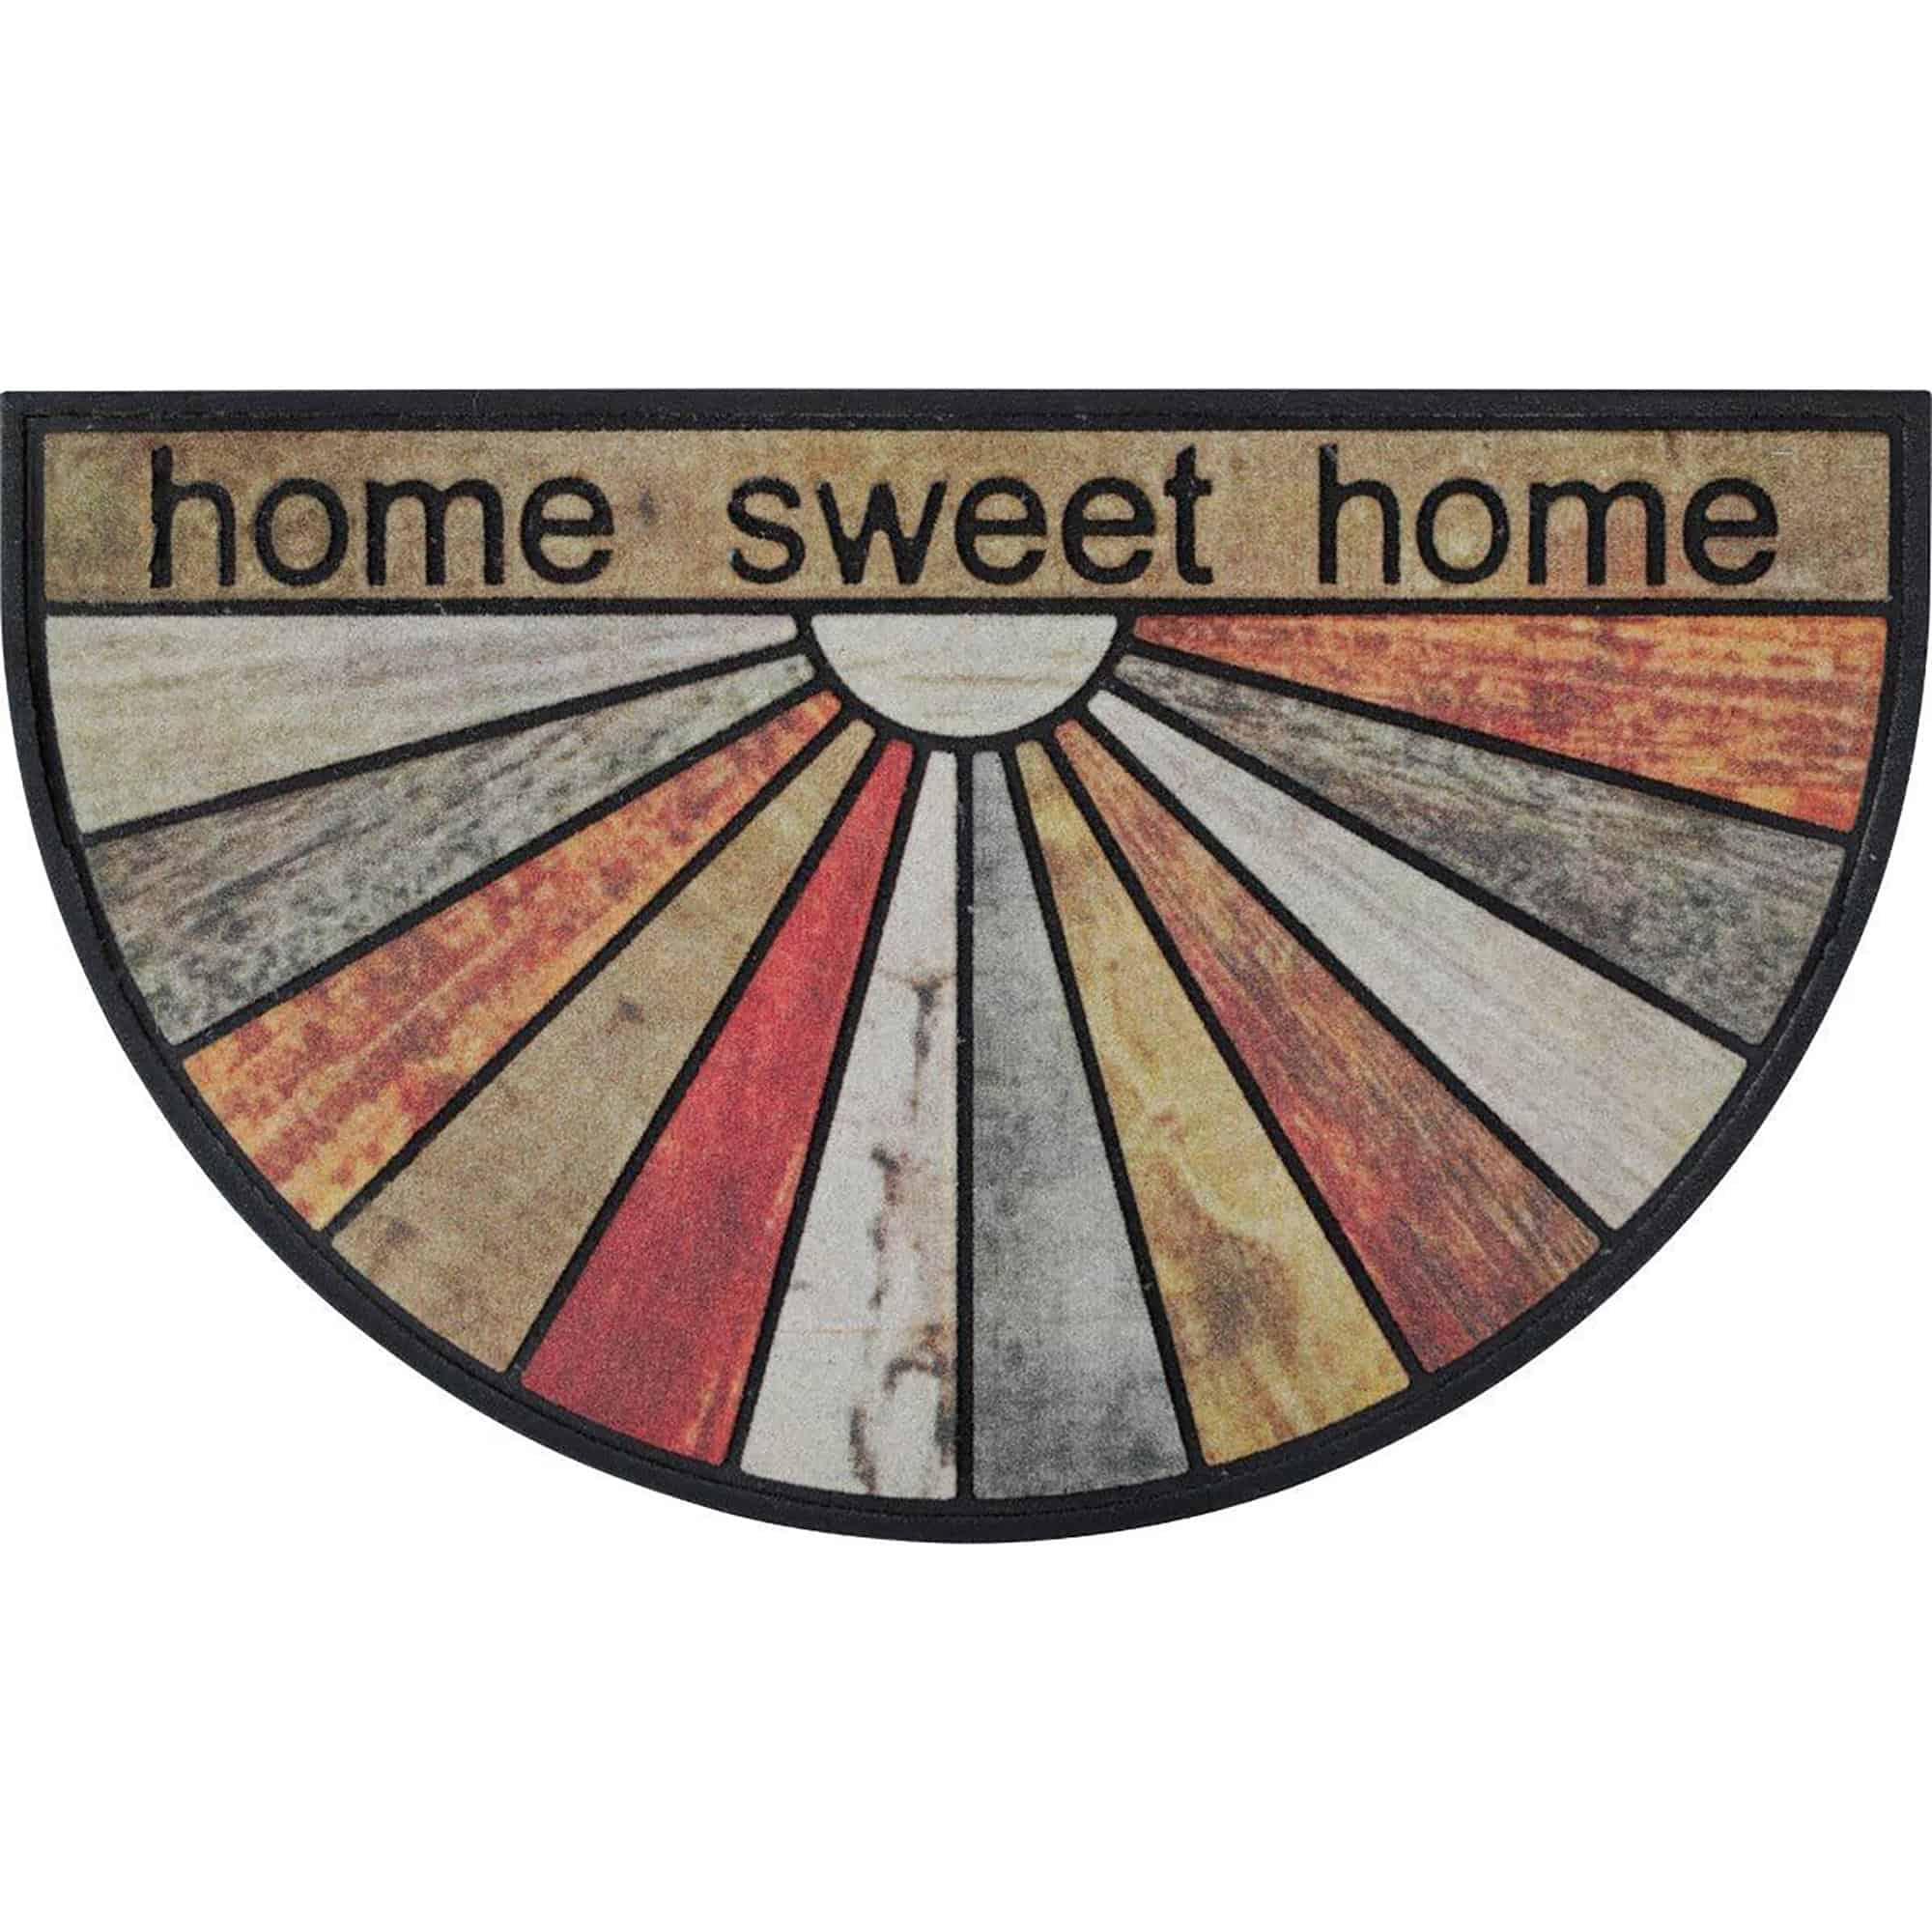 Home Sweet Home Half Round Front Doormat Outdoor 30 x 18 Recycled Rubber Door Mat for Entry Way